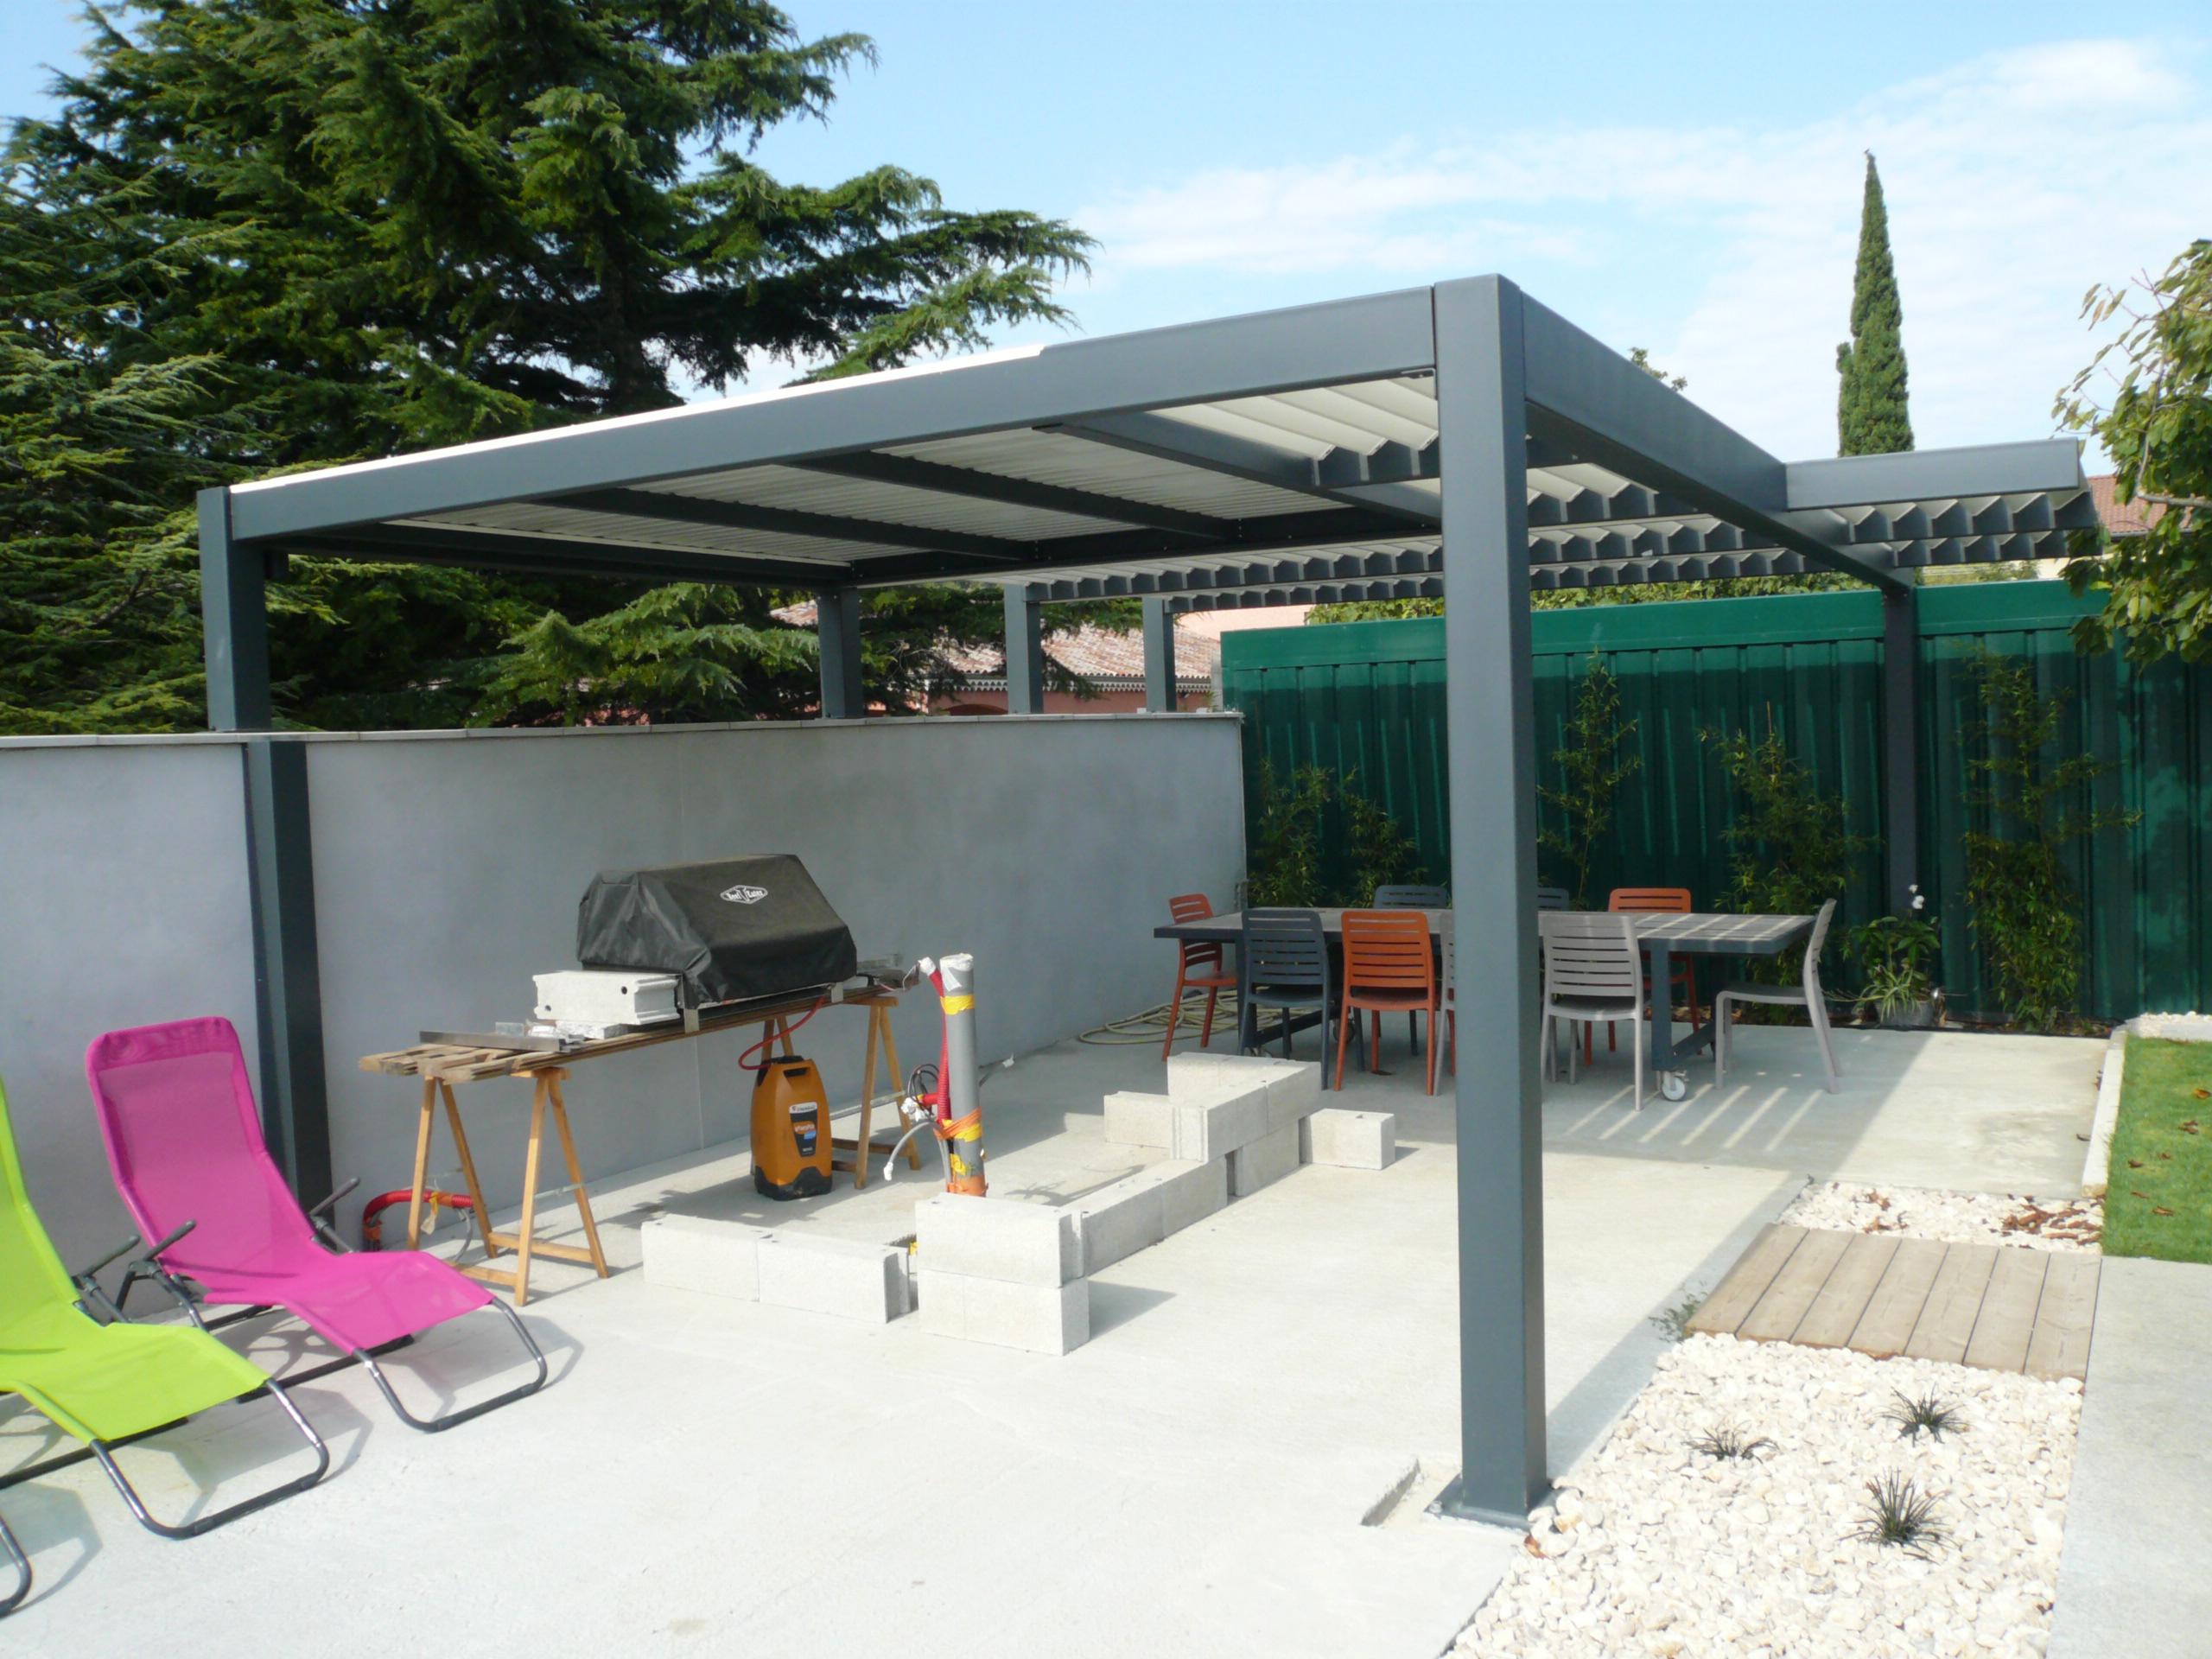 Pergola en tube, toit en lames brise-soleil